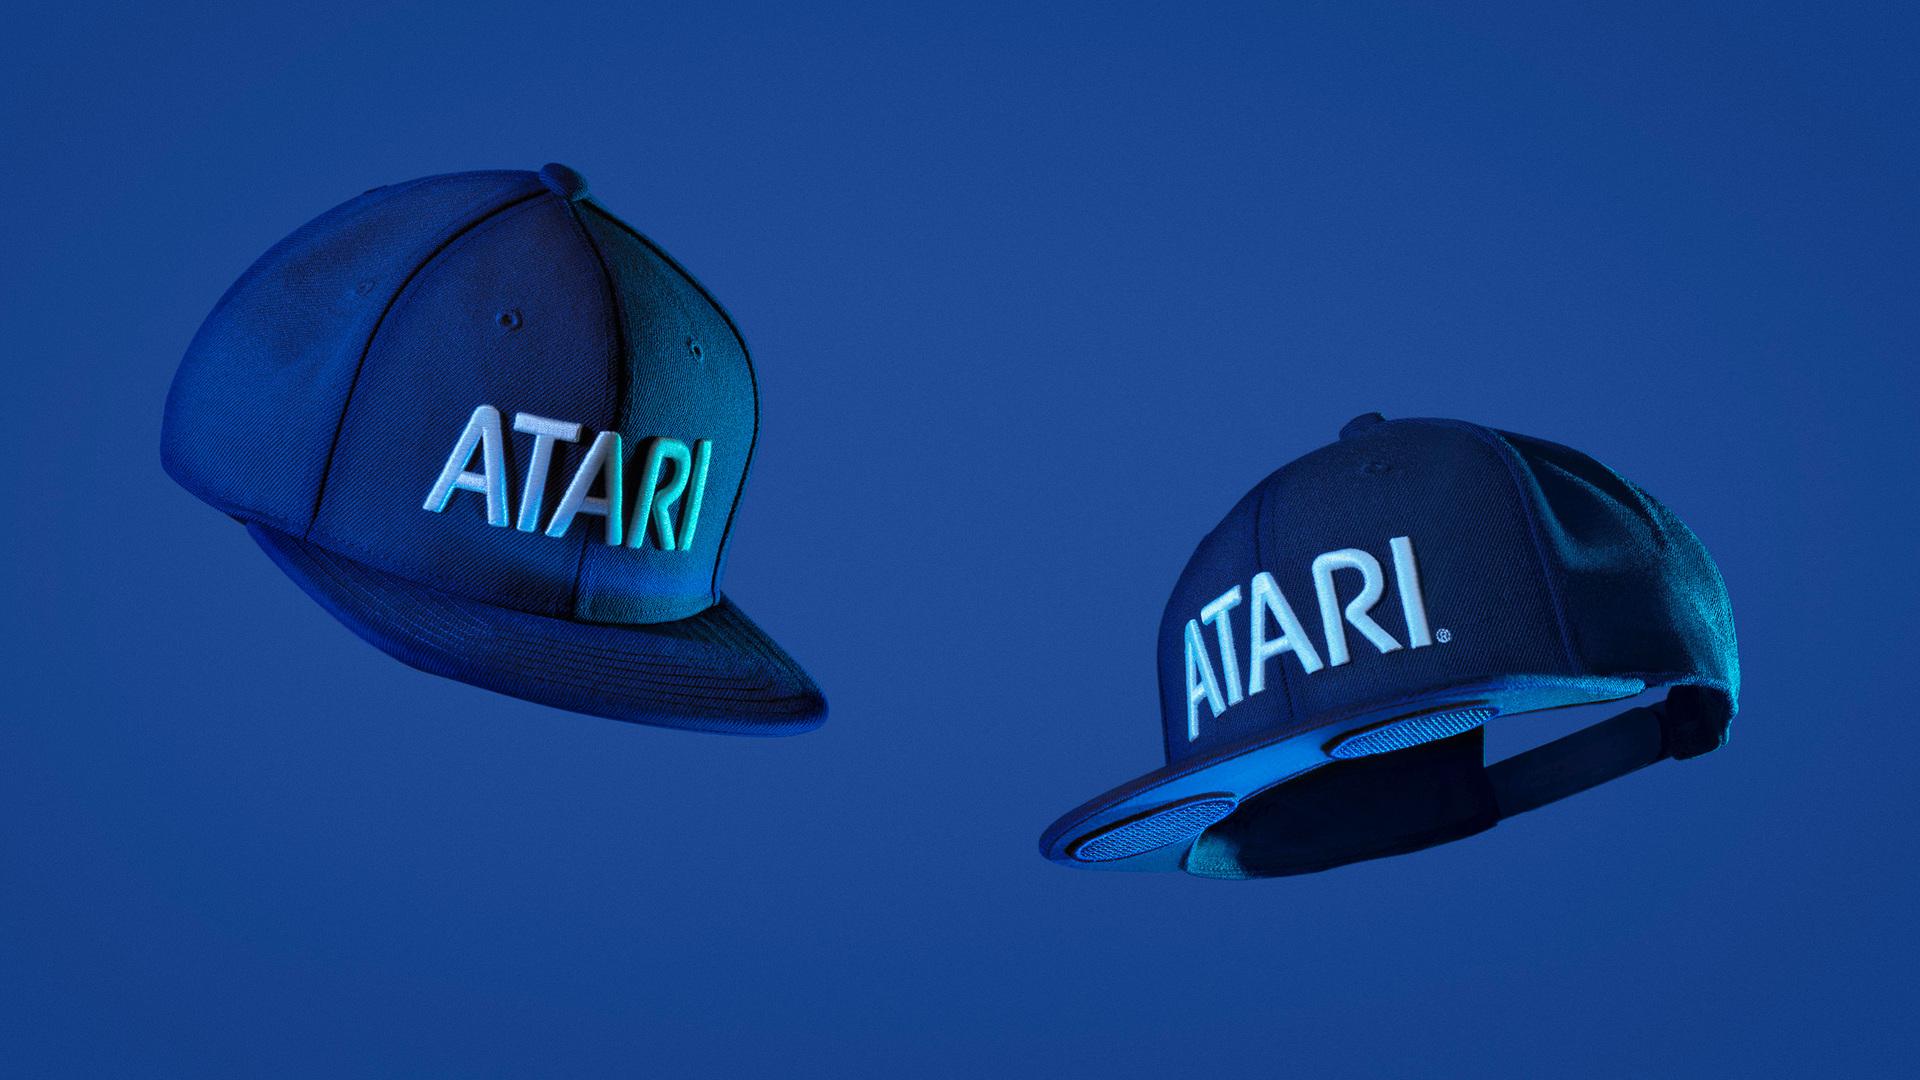 Atari's Asshat | Super Best Audio Friends